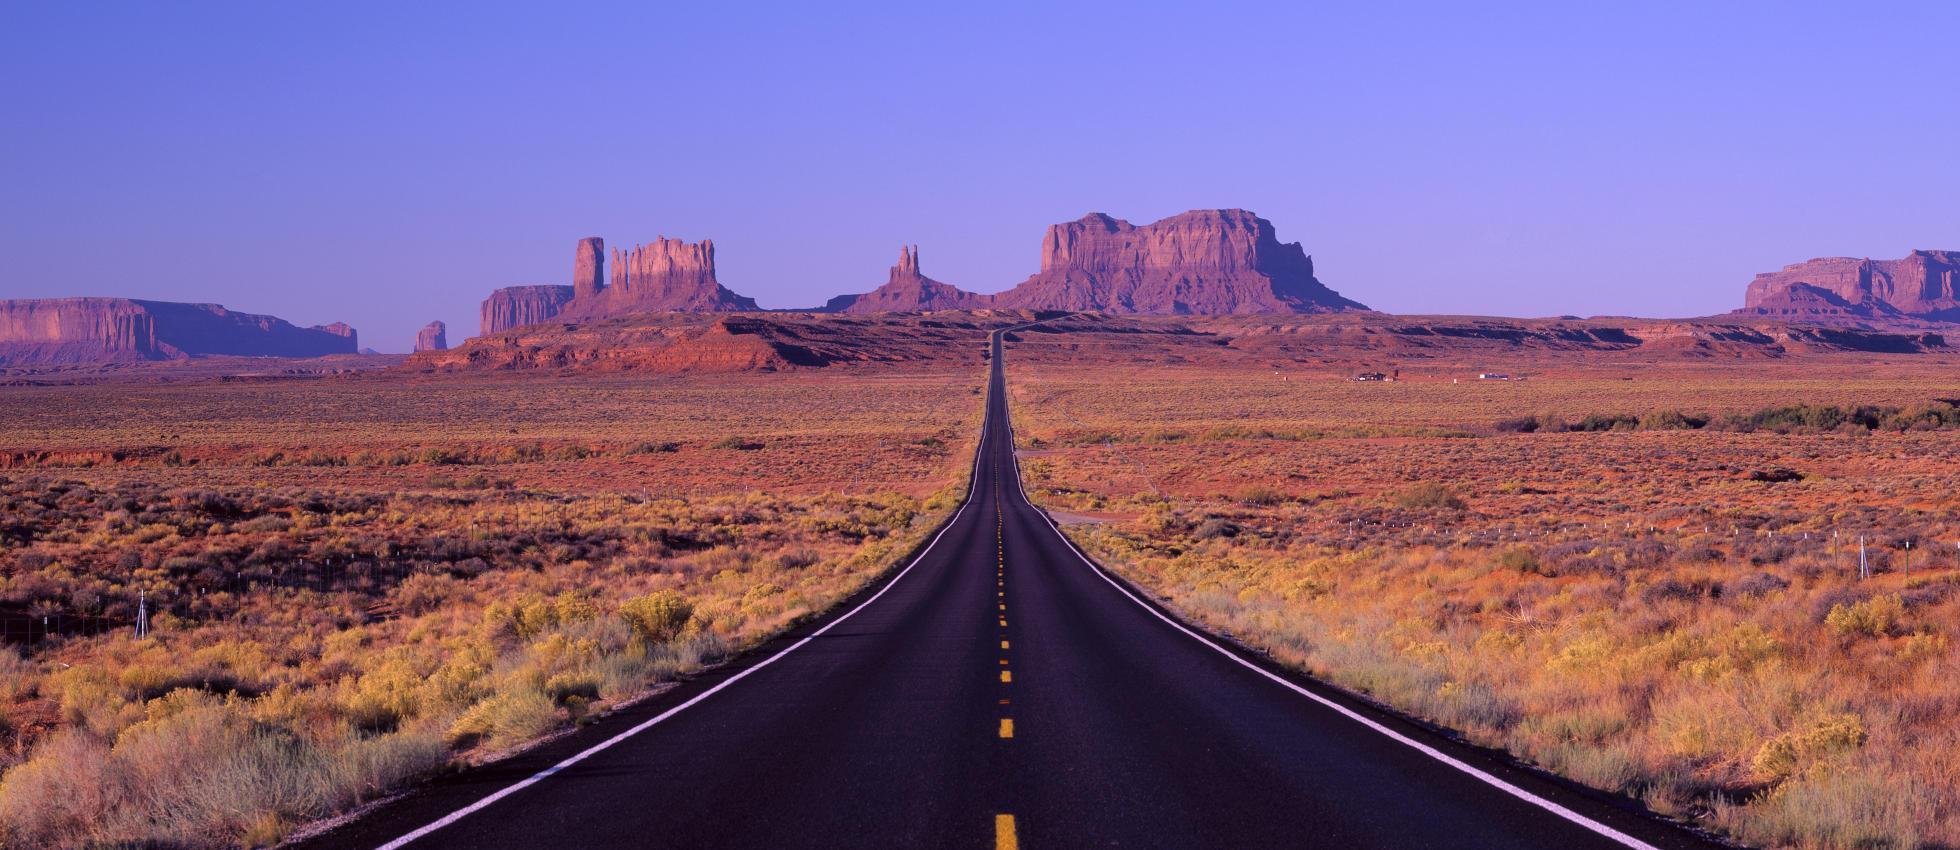 Gap Year Program - ARCC Gap   Southwest: Utah, Colorado, New Mexico, Arizona & California  3